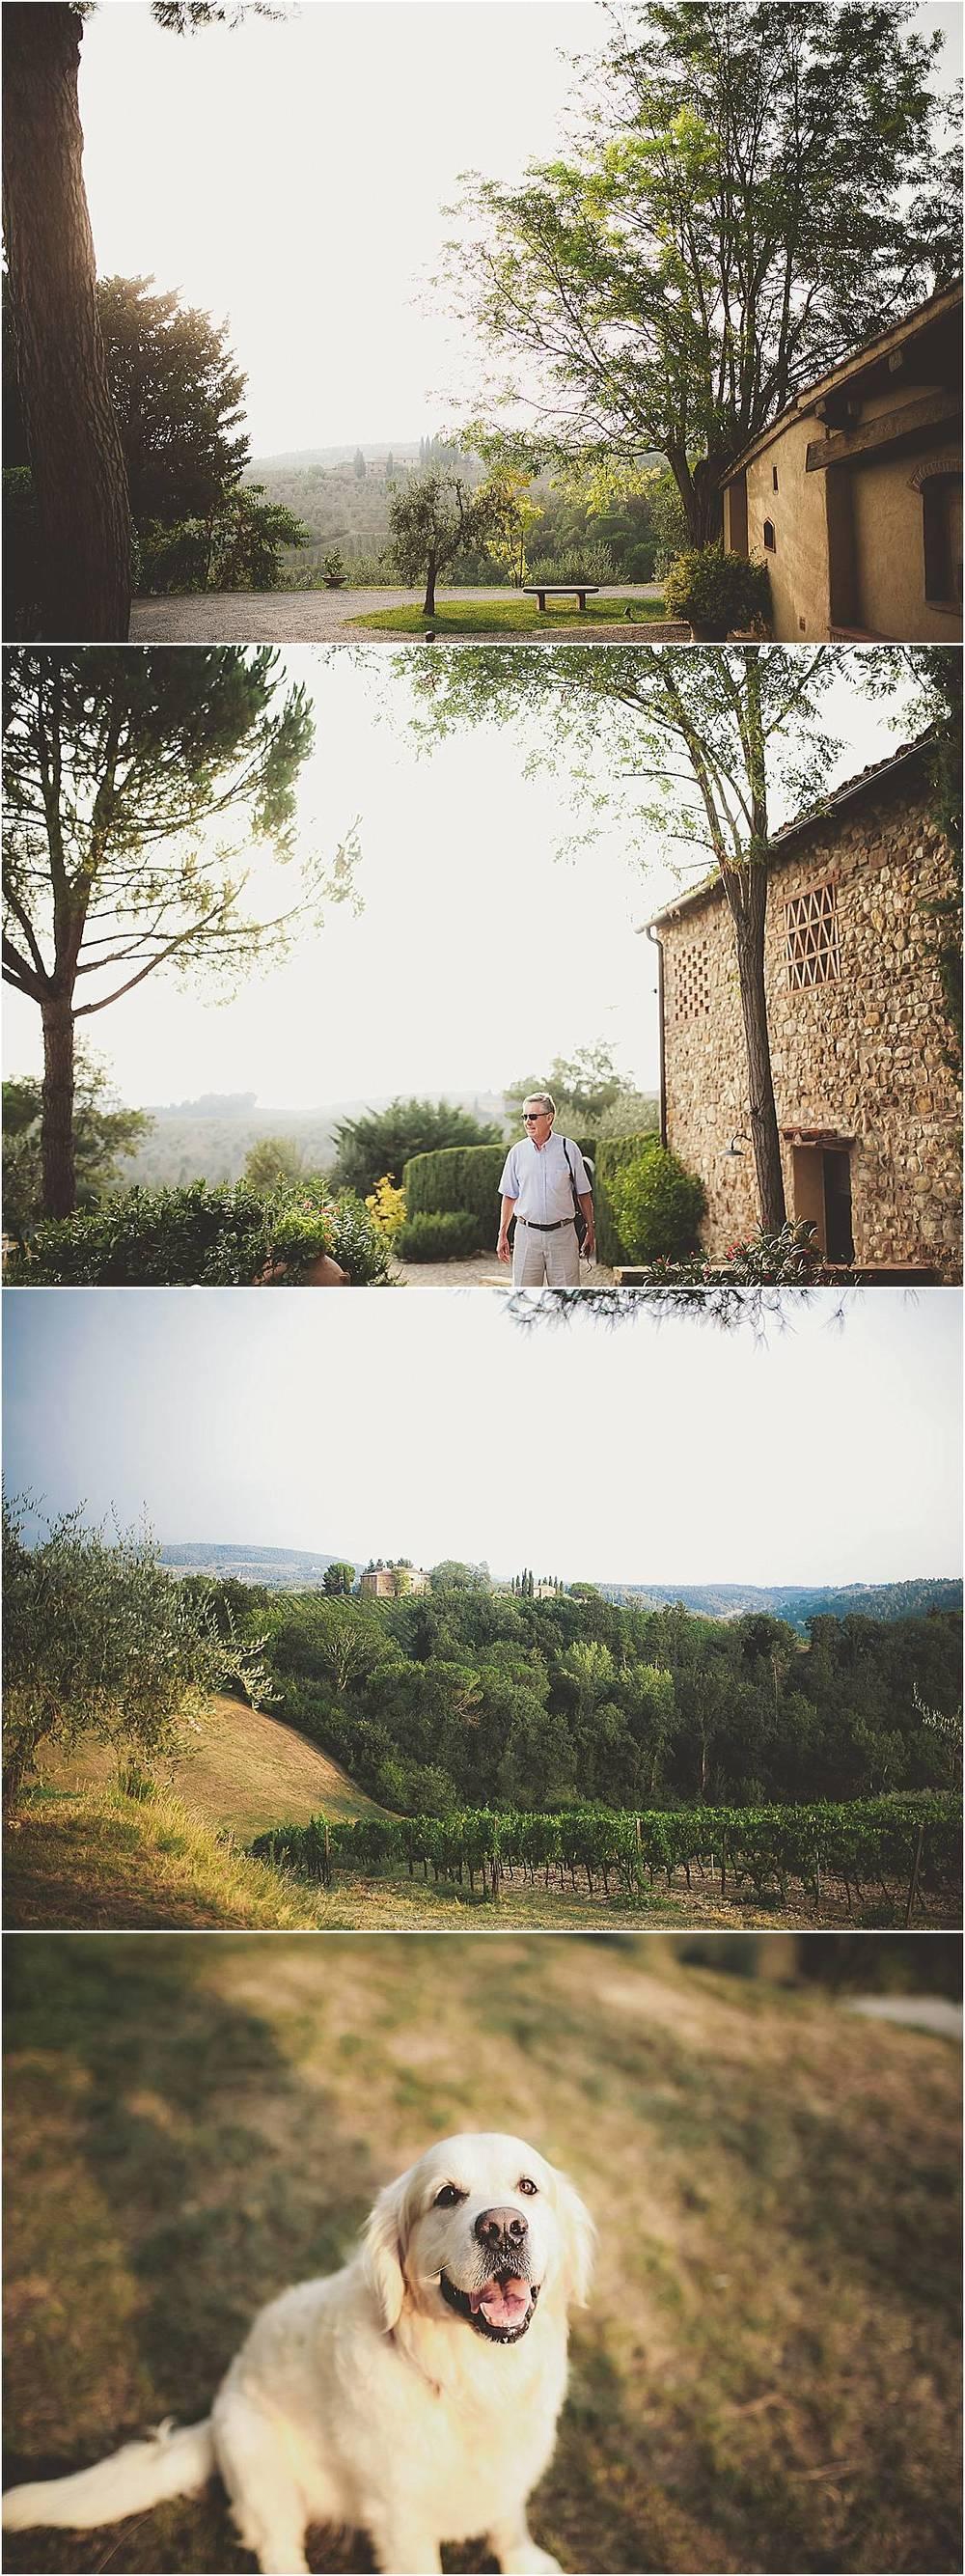 Italy_2015-1.jpg